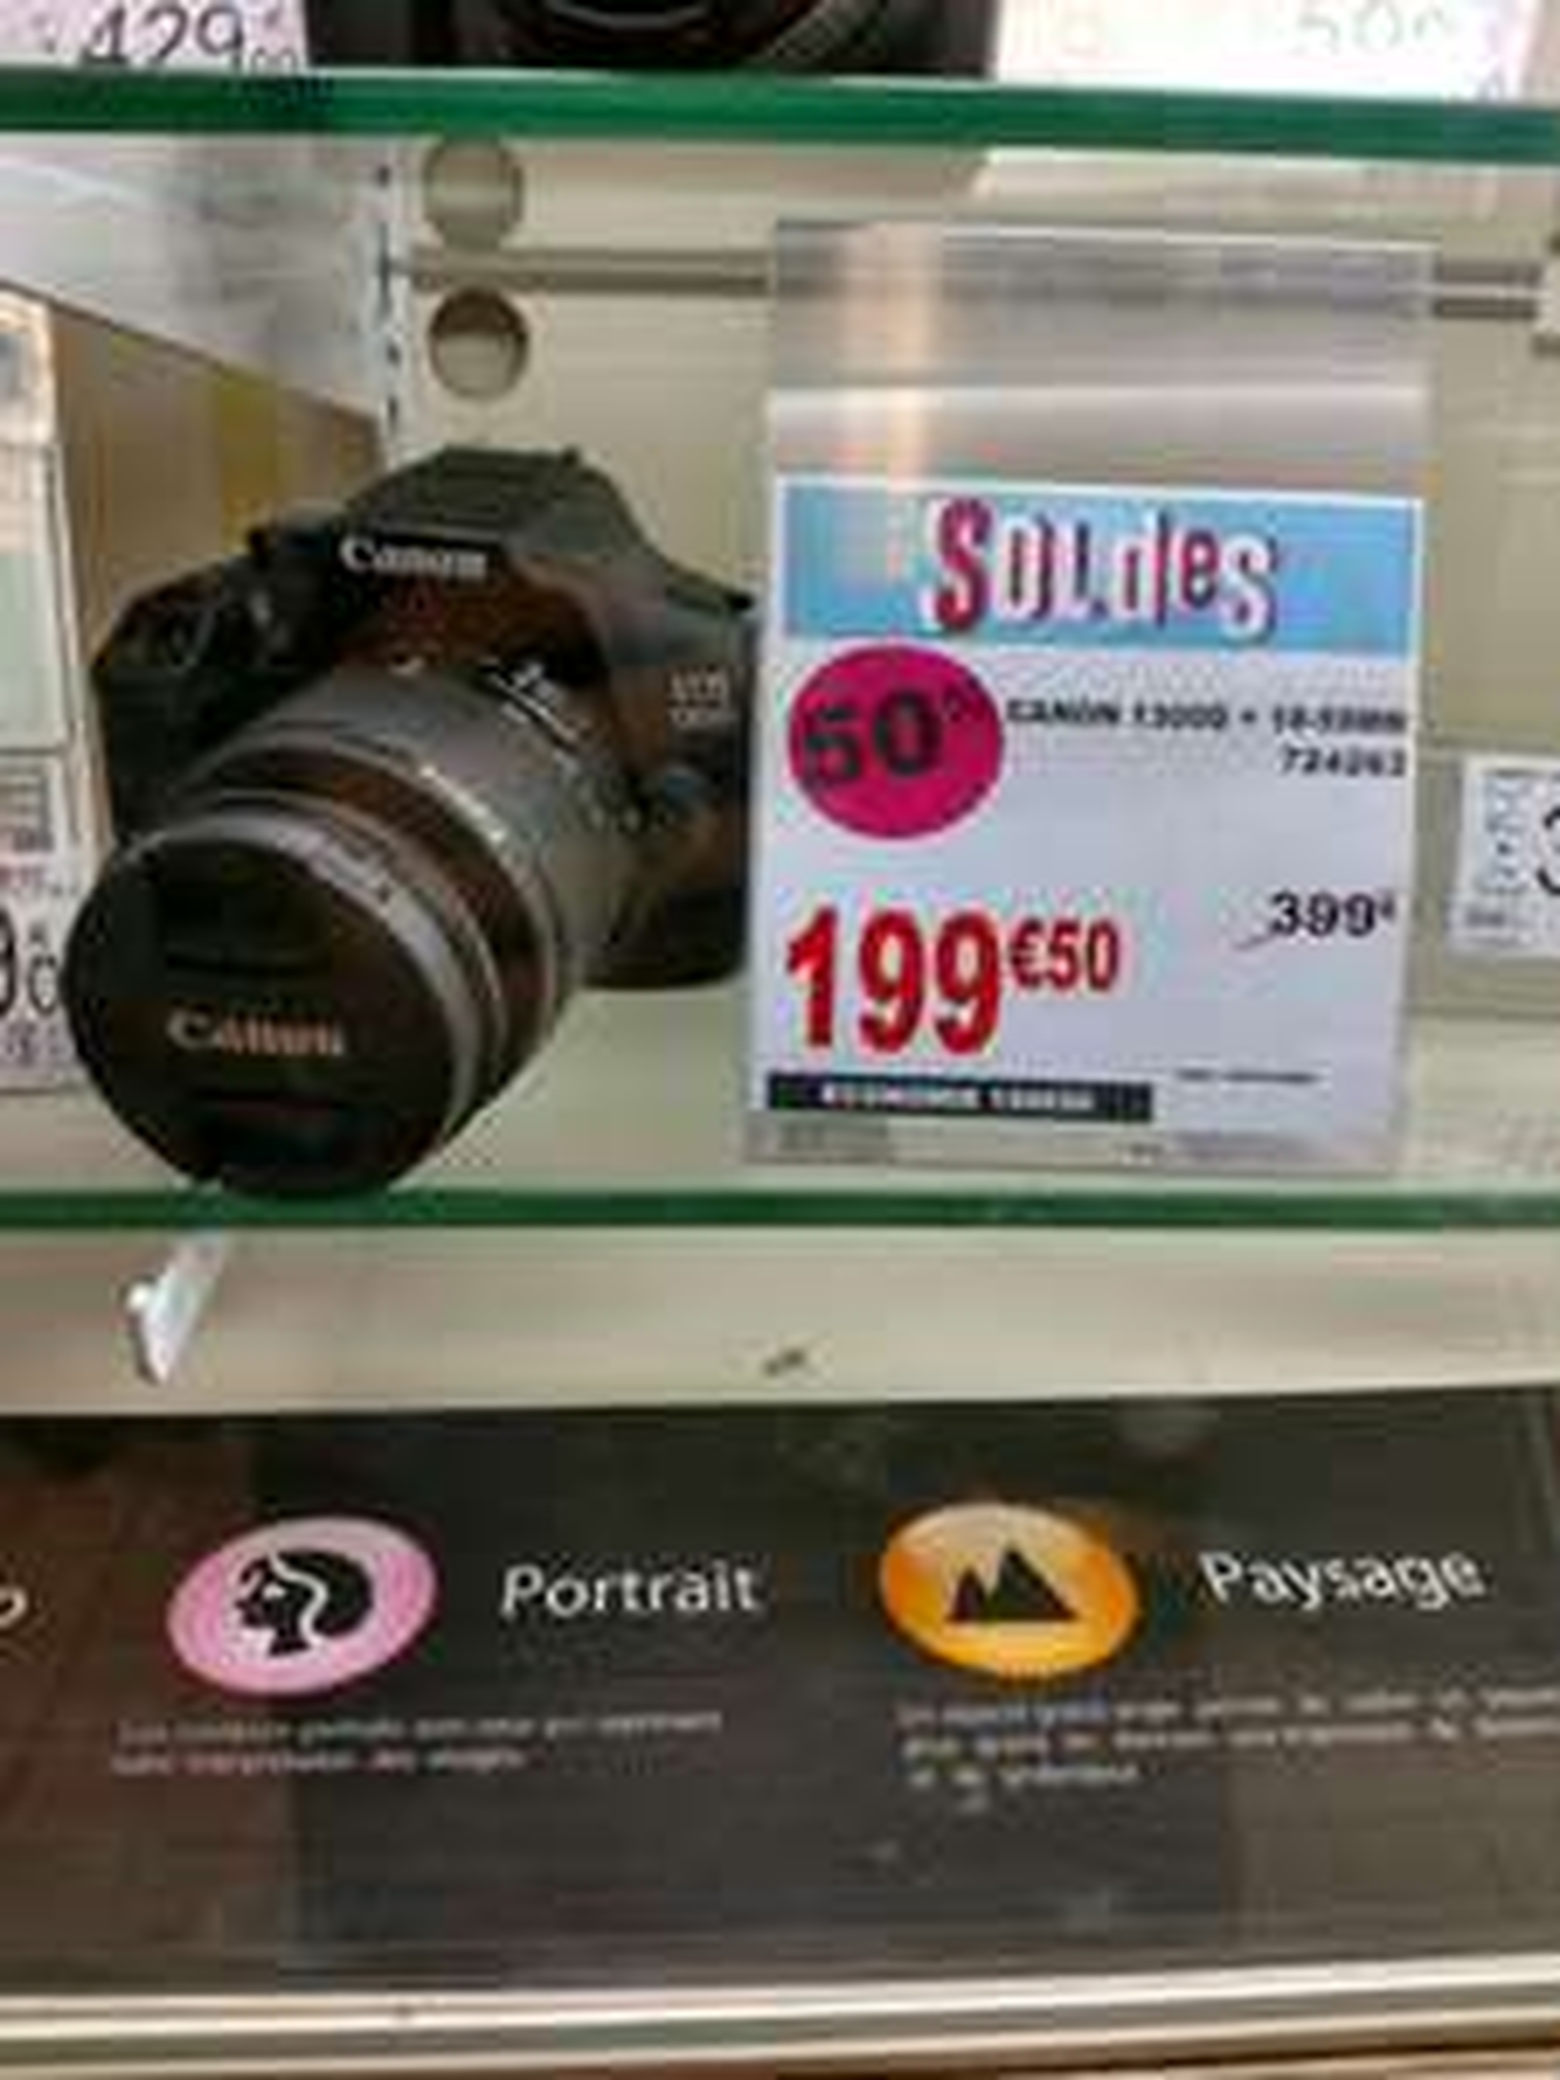 Appareil photo Reflex Canon 1300d + objectif 18-55 - Auchan Béziers (34)